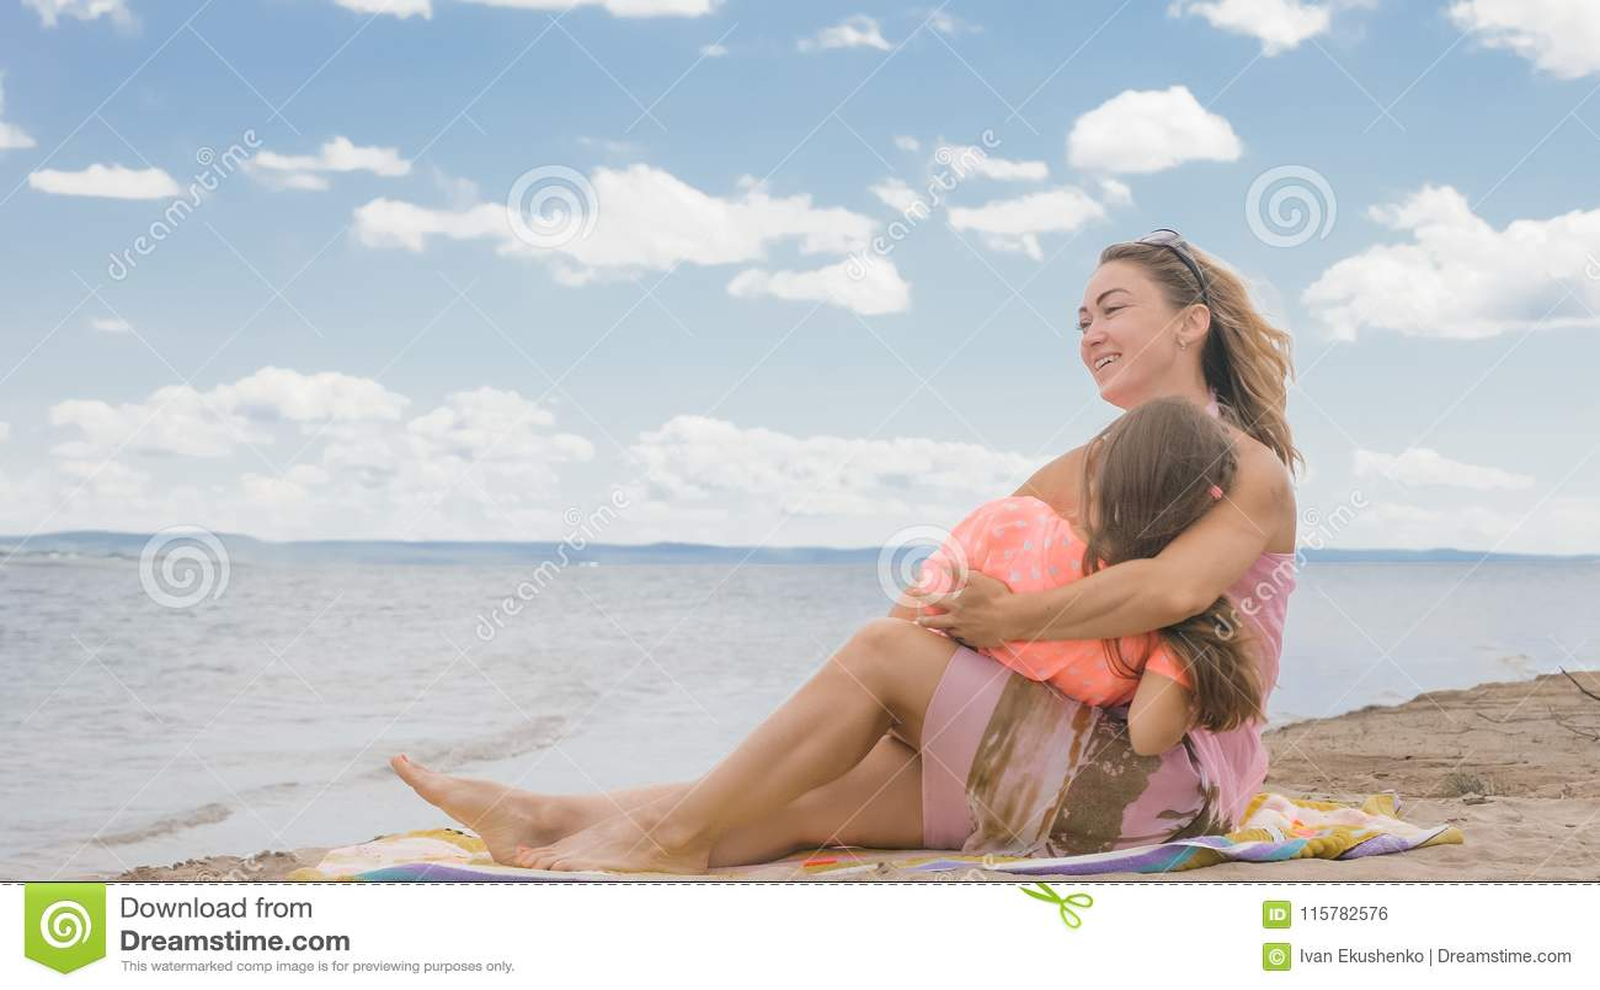 boy kiss beach girl Young